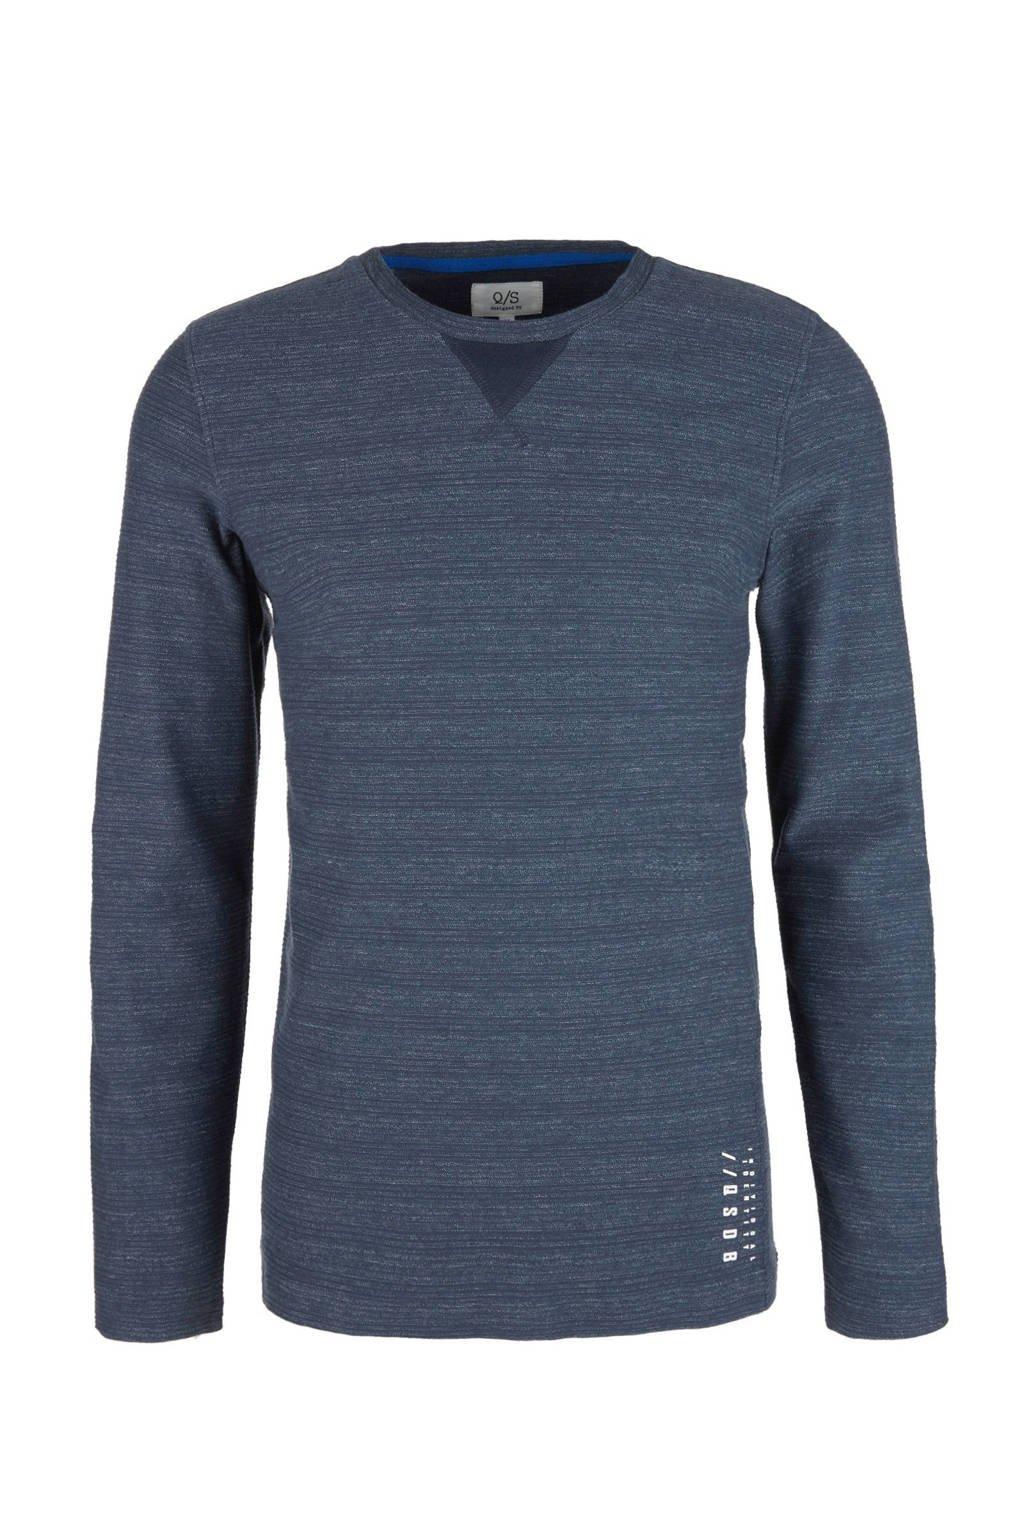 Q/S designed by gemêleerd T-shirt donkerblauw, Donkerblauw